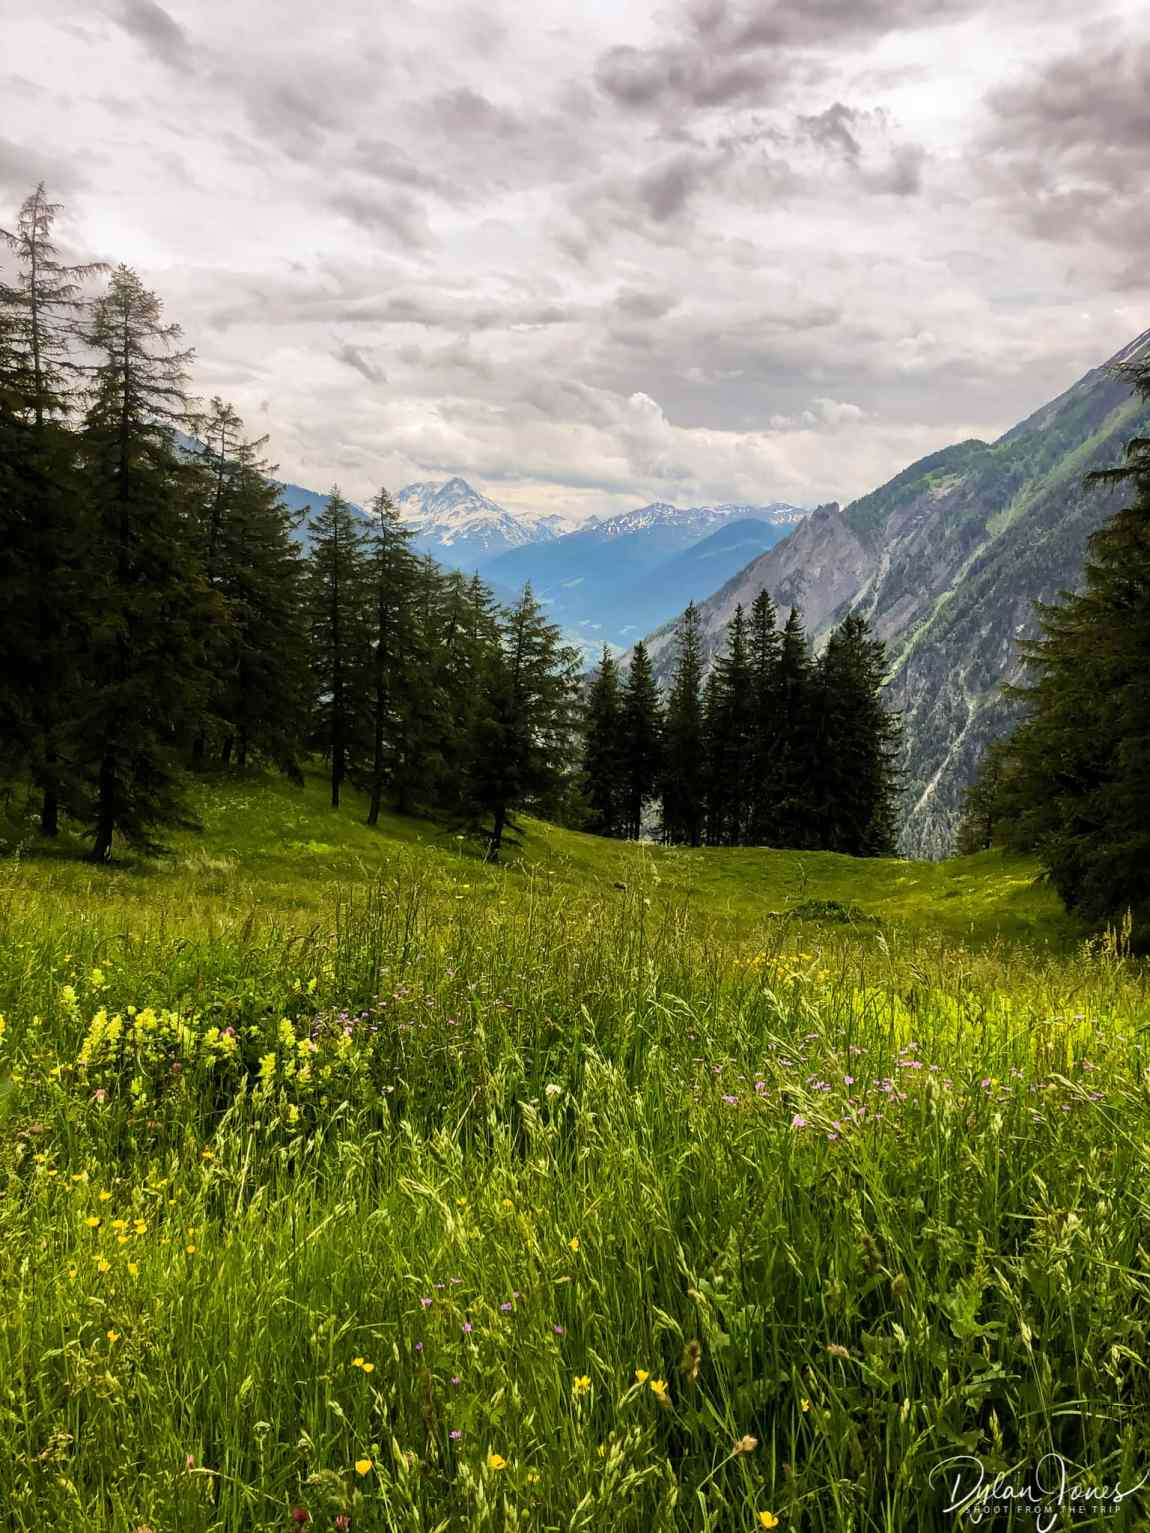 The Col des Planches mountain pasture